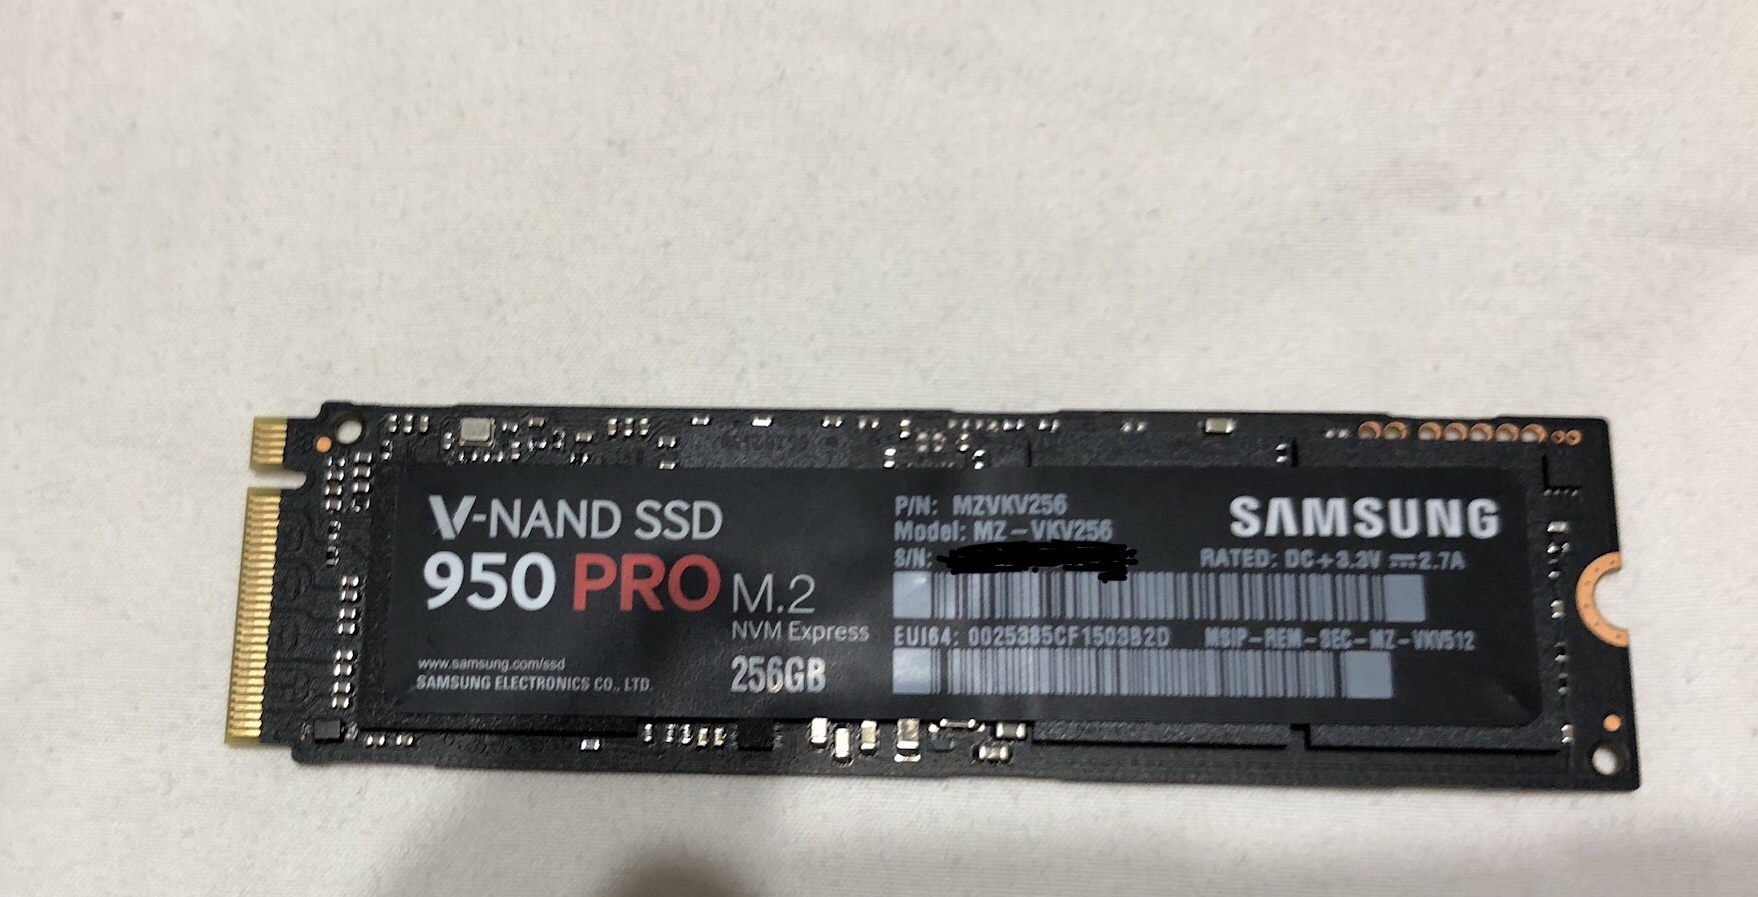 [VENDIDO] Samsung Pro 950 M.2 250 GB